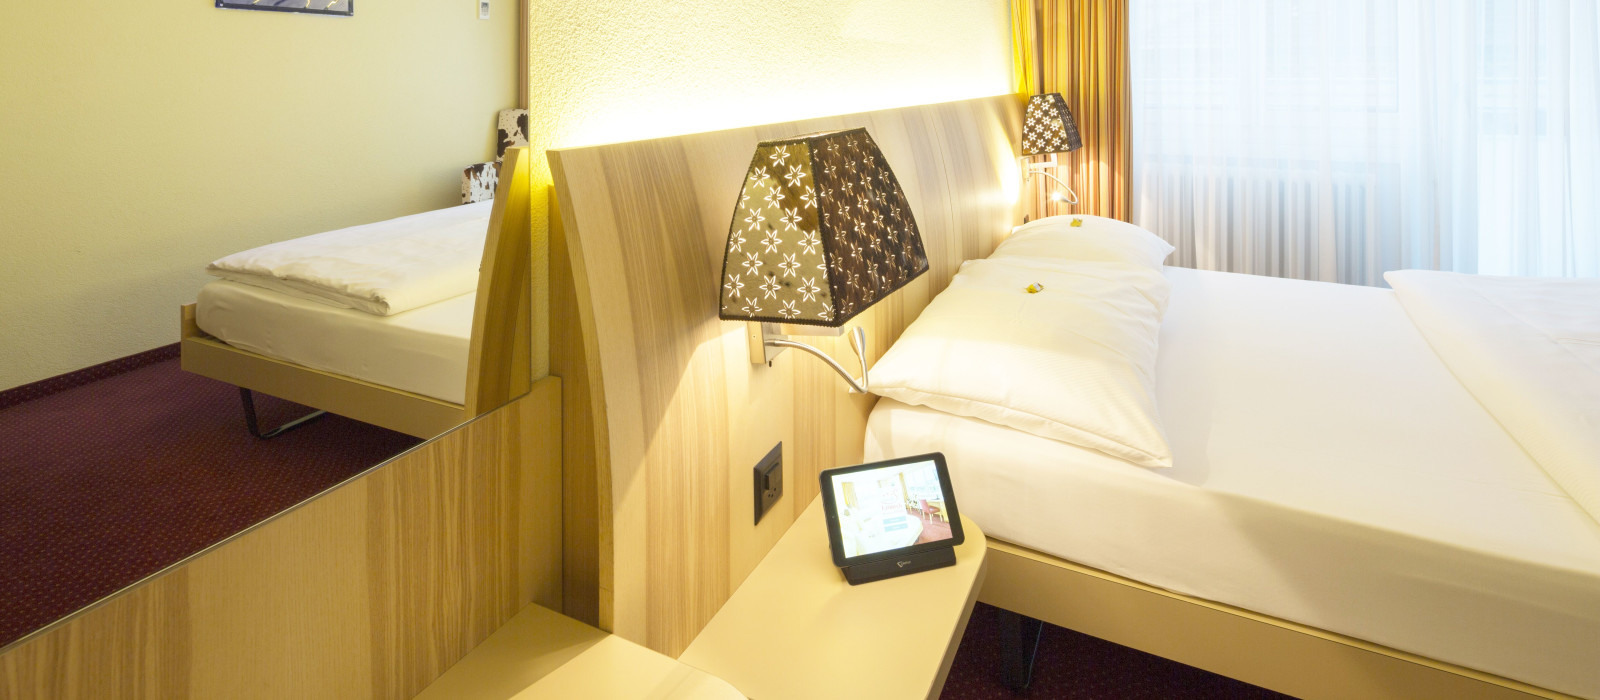 Hotel Leoneck Swiss  %region%